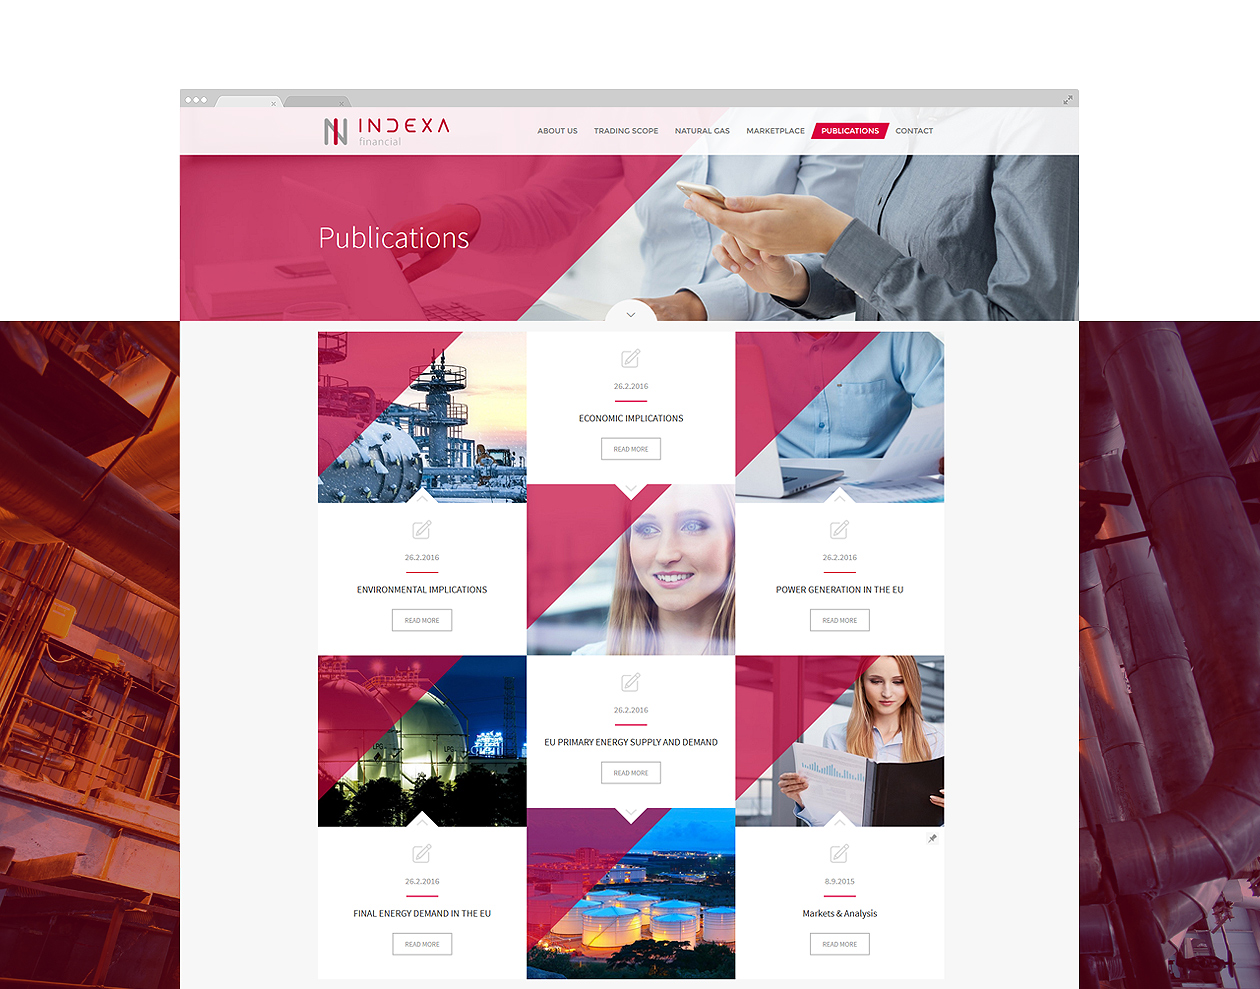 logo-design-webdesign-indexa-06